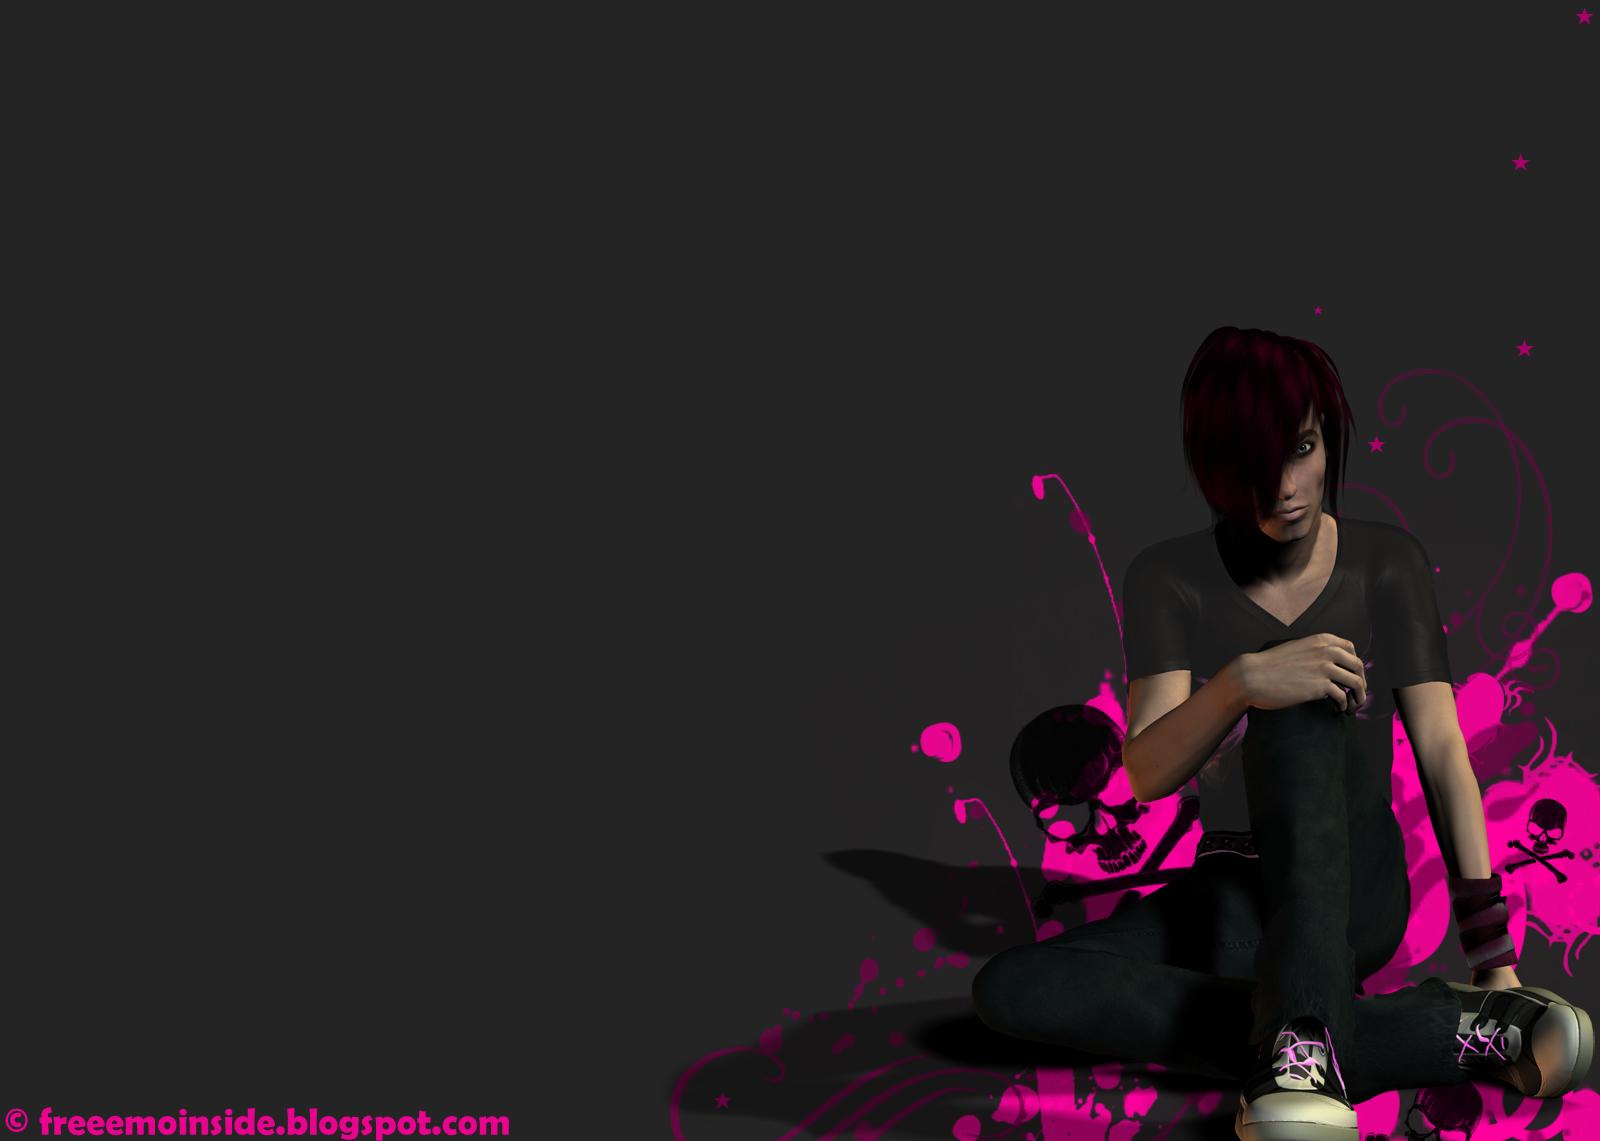 Emo Boys Wallpaper Download Wallpaper DaWallpaperz 1600x1141